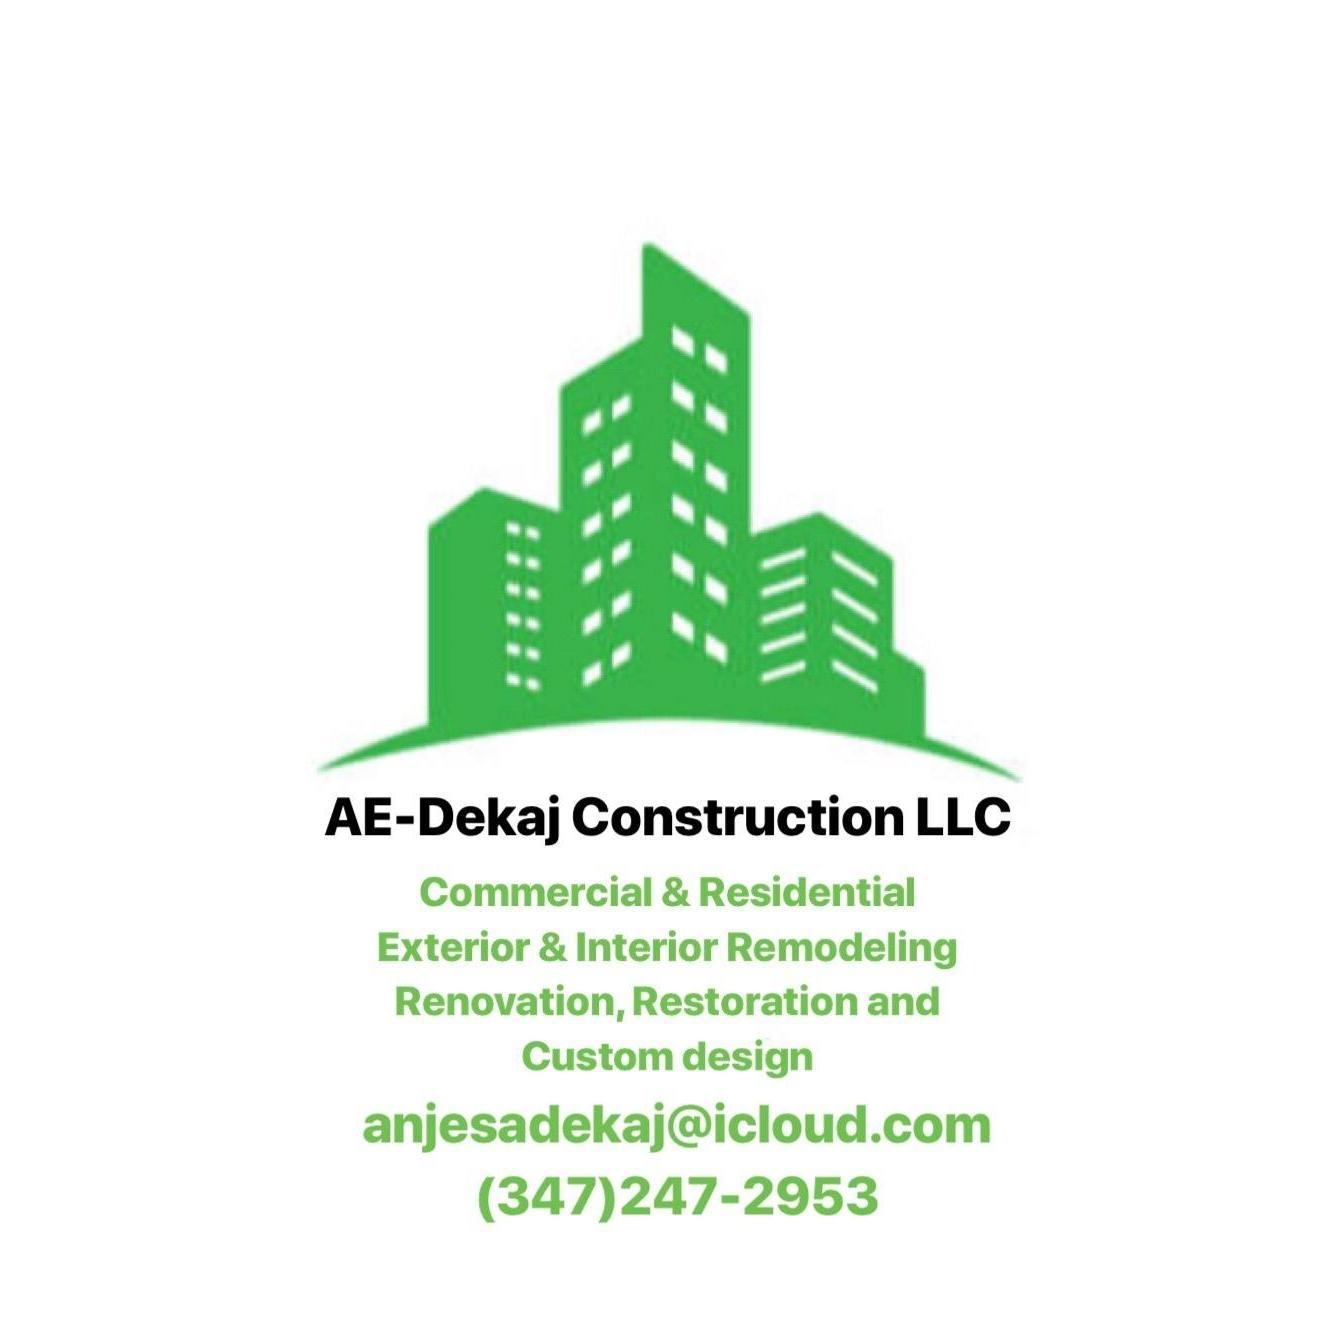 AE-Dekaj Construction LLC